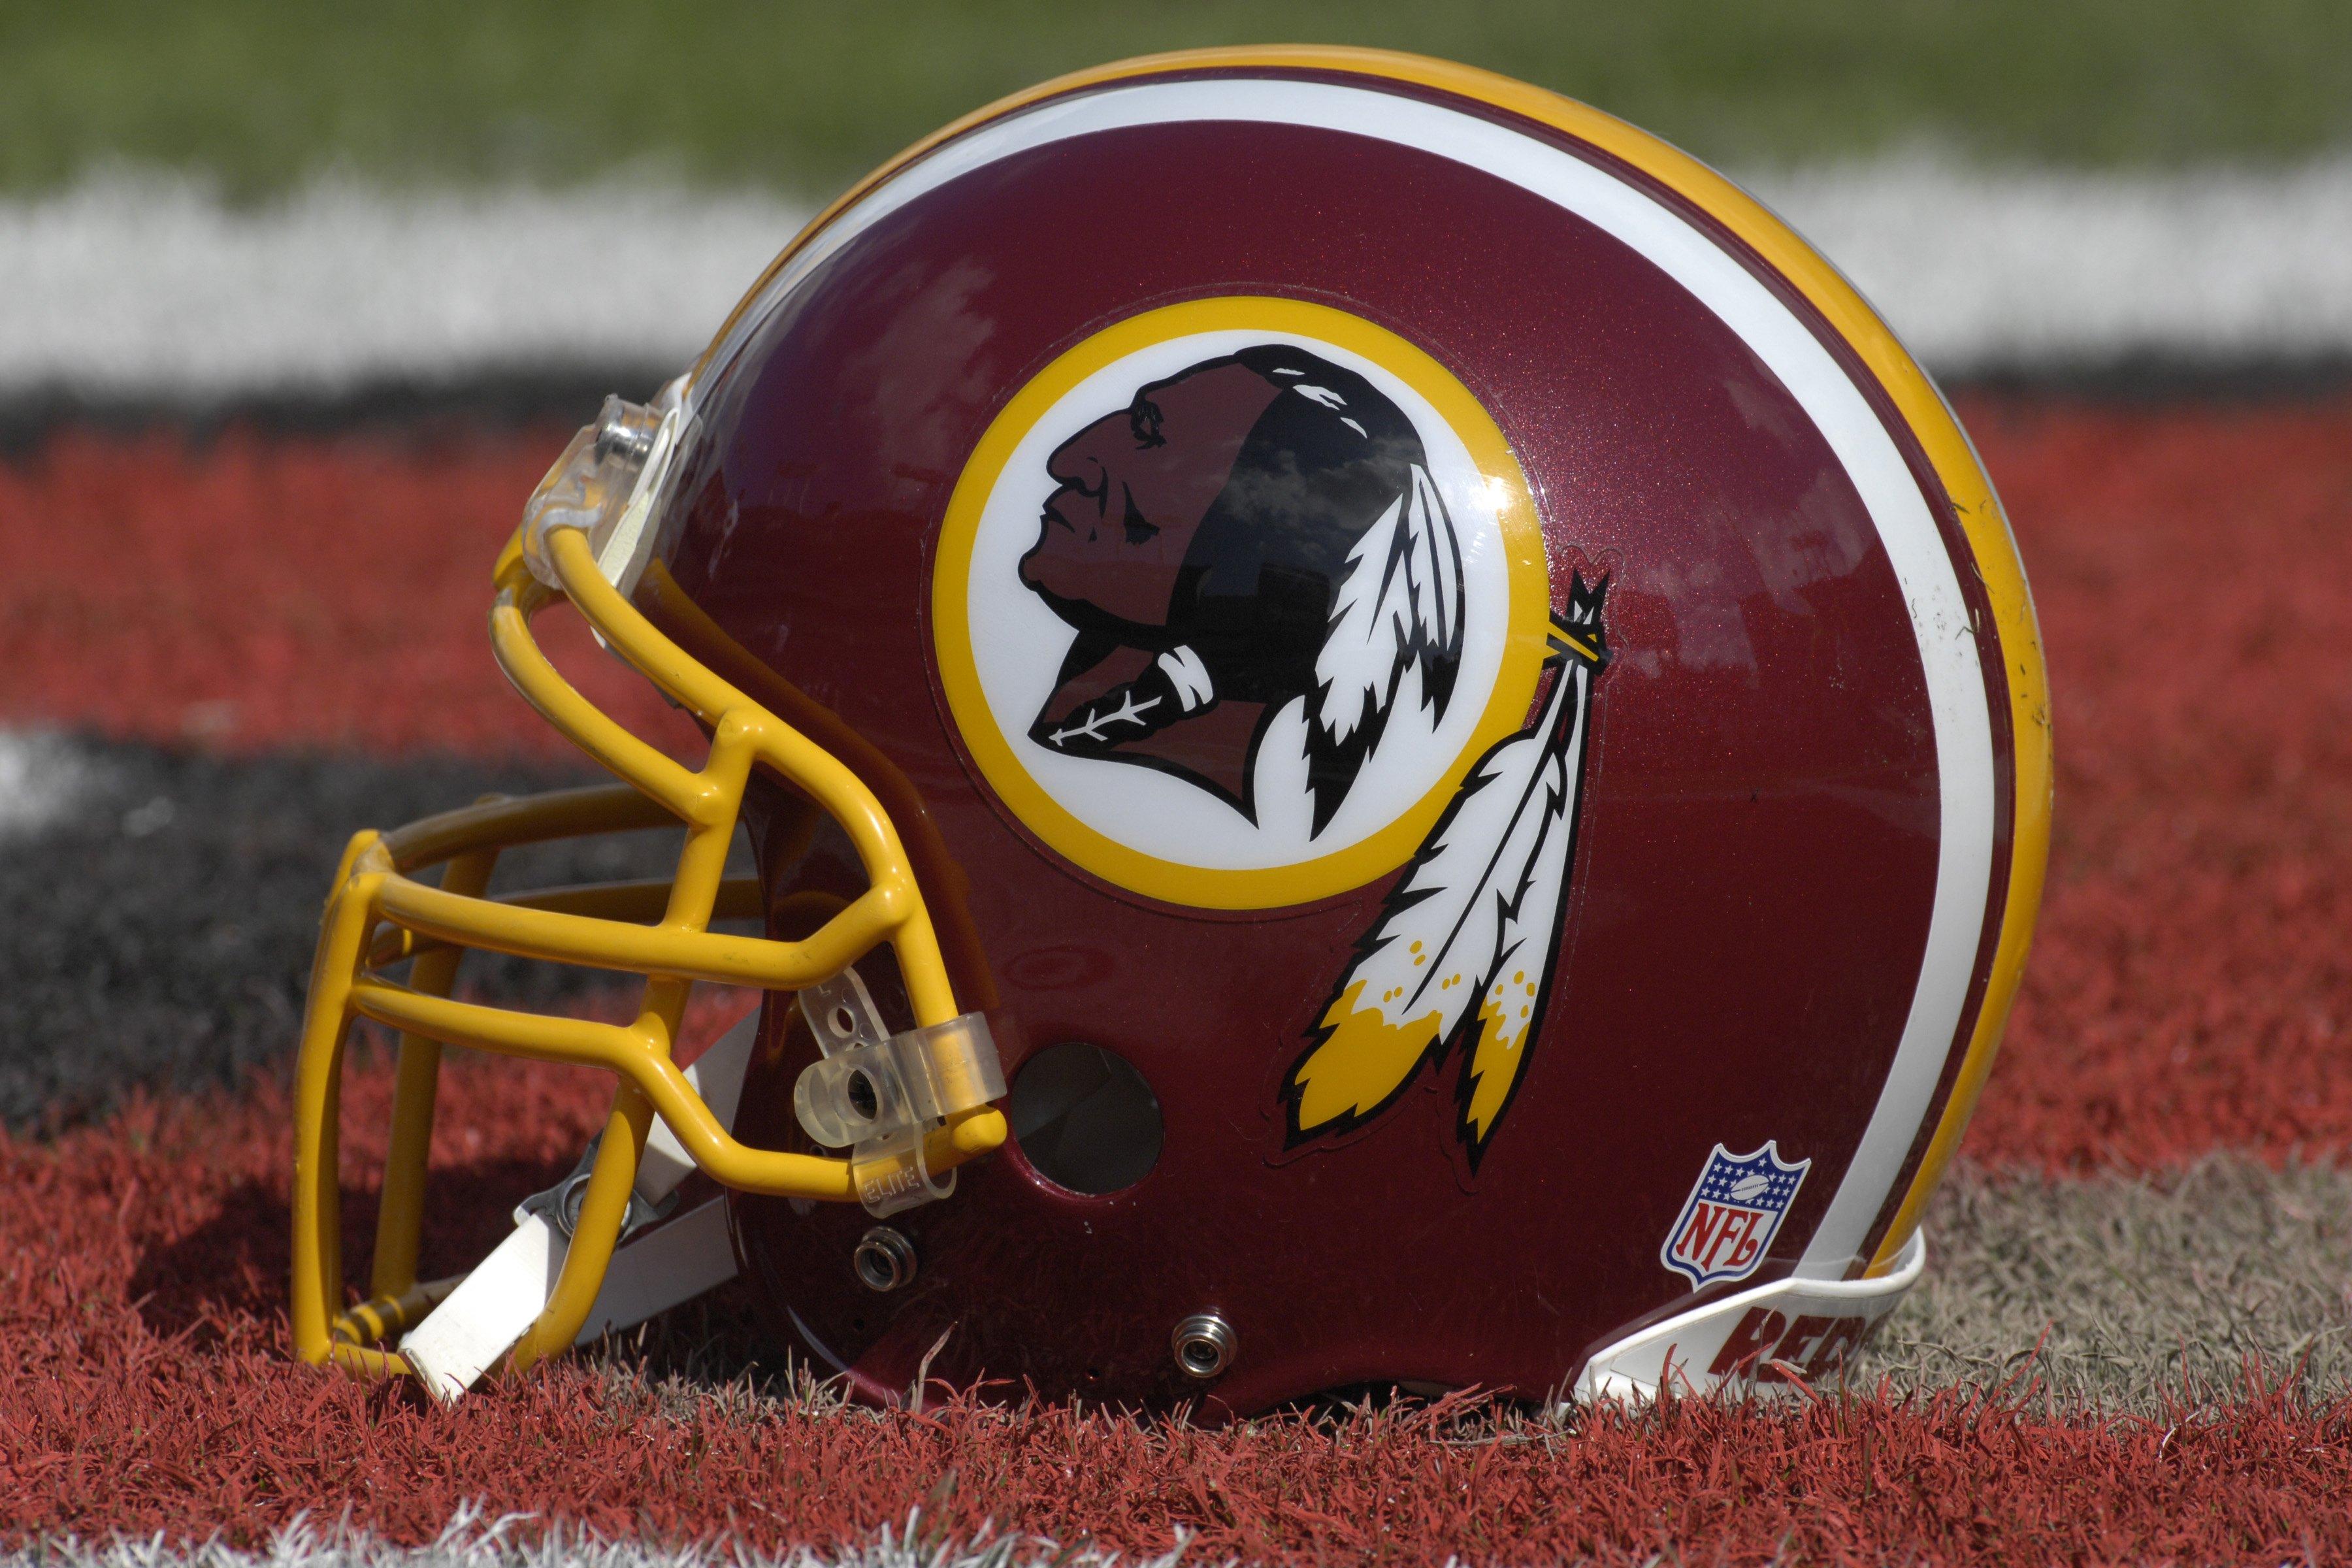 sale retailer d2576 dbbe9 Washington Redskins Uniforms through the Years | Bleacher ...